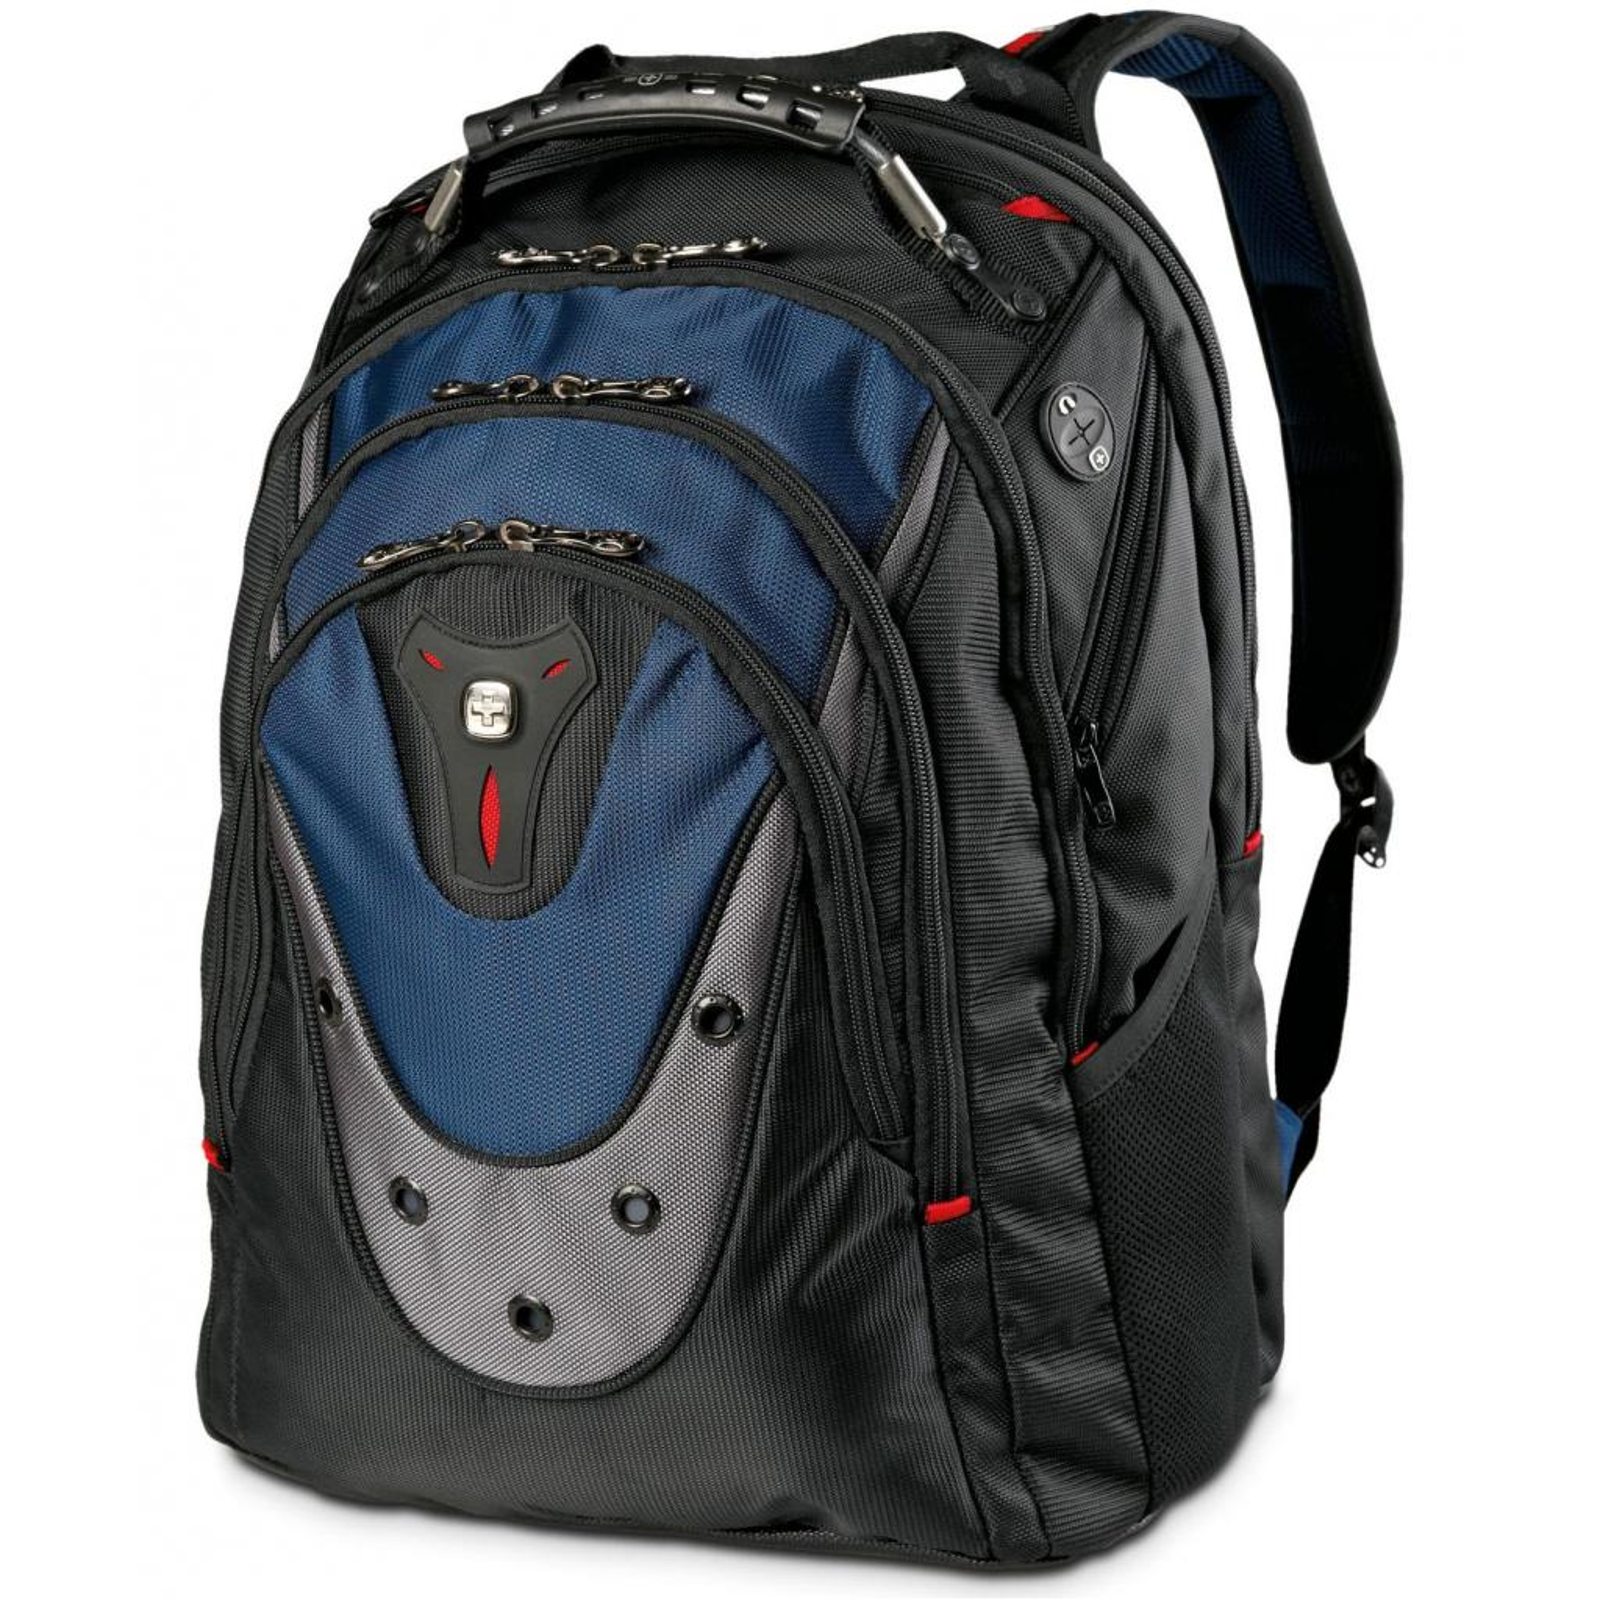 "Рюкзак для ноутбука Wenger 17"" Ibex Black/Blue (600638) изображение 4"